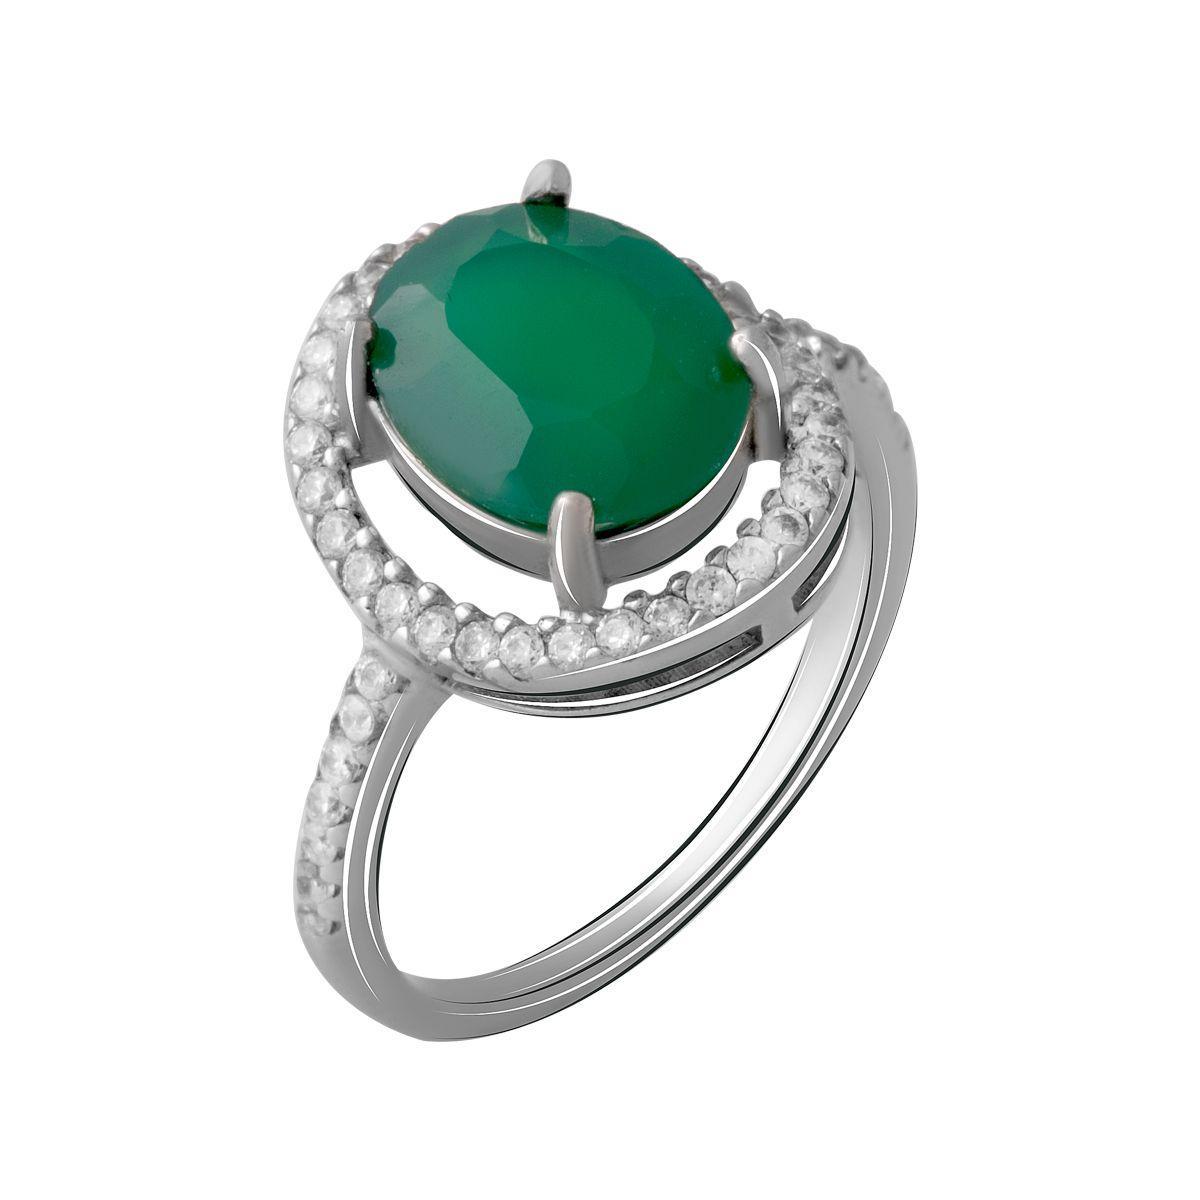 Серебряное кольцо DreamJewelry с натуральным агатом (1952375) 16.5 размер